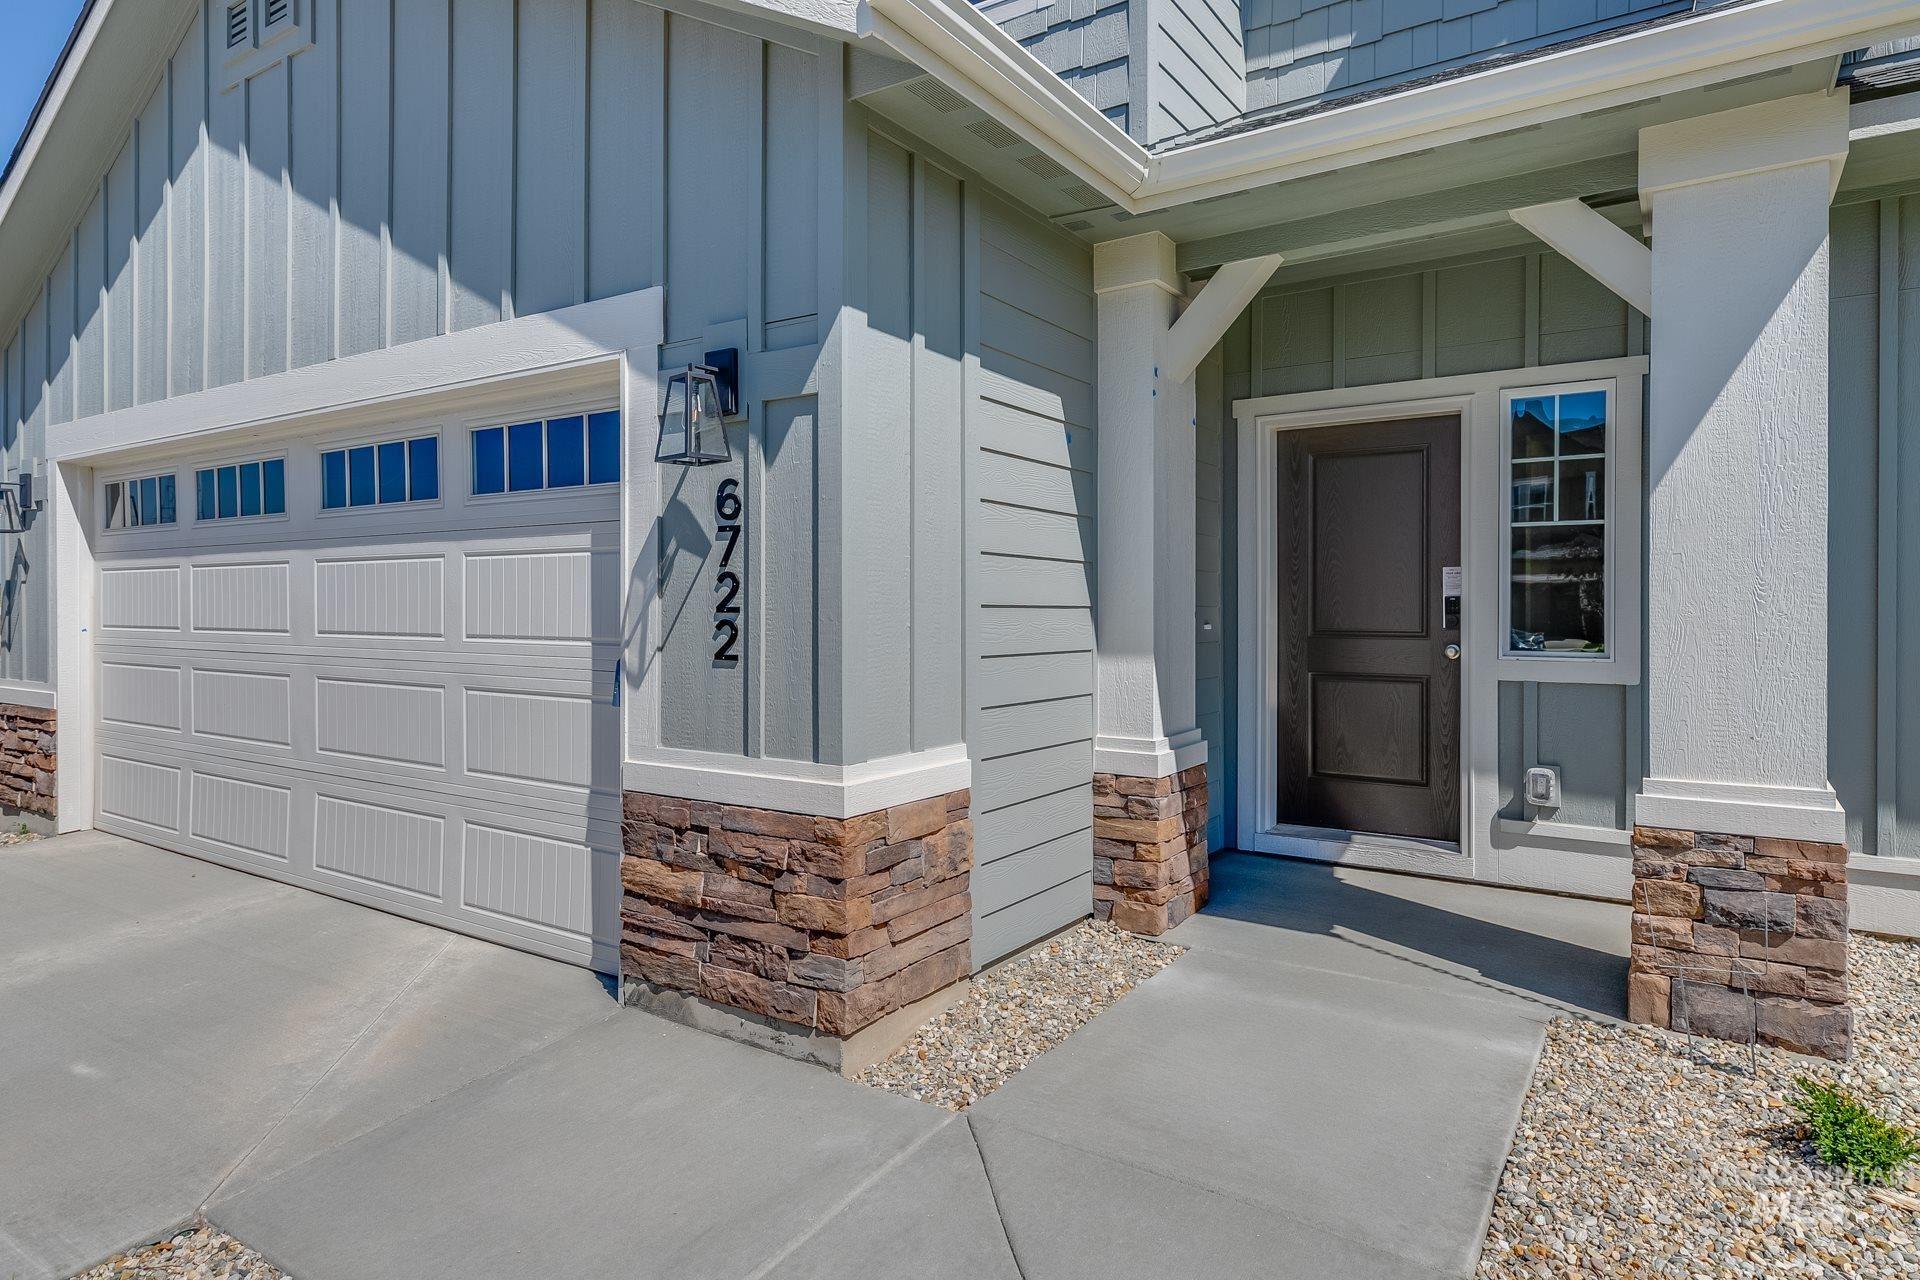 Photo of 6722 E Zaffre Ridge St, Boise, ID 83716 (MLS # 98768614)